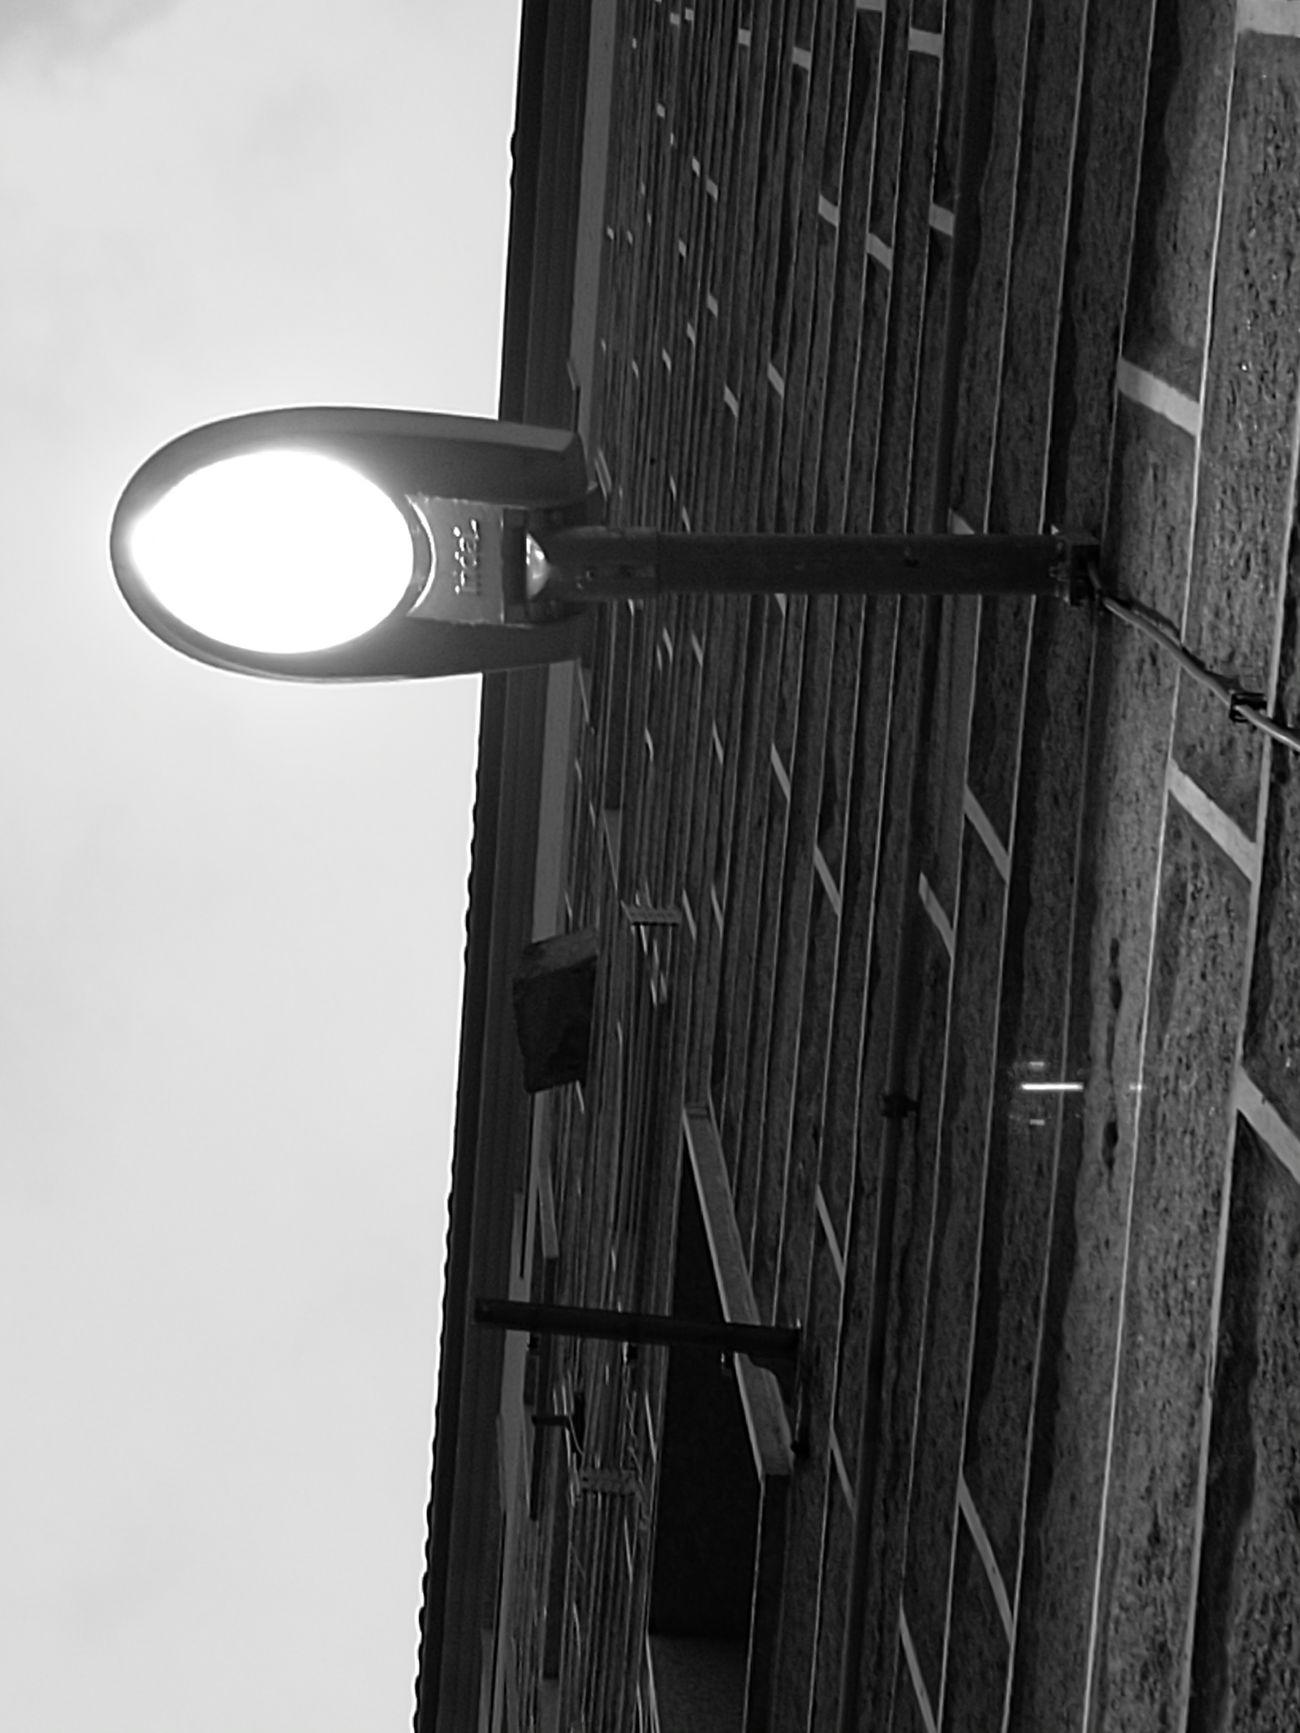 Y se hizo la luz. Reflejos Monochrome Blackandwhite Photography Original Photo Huawei P9.